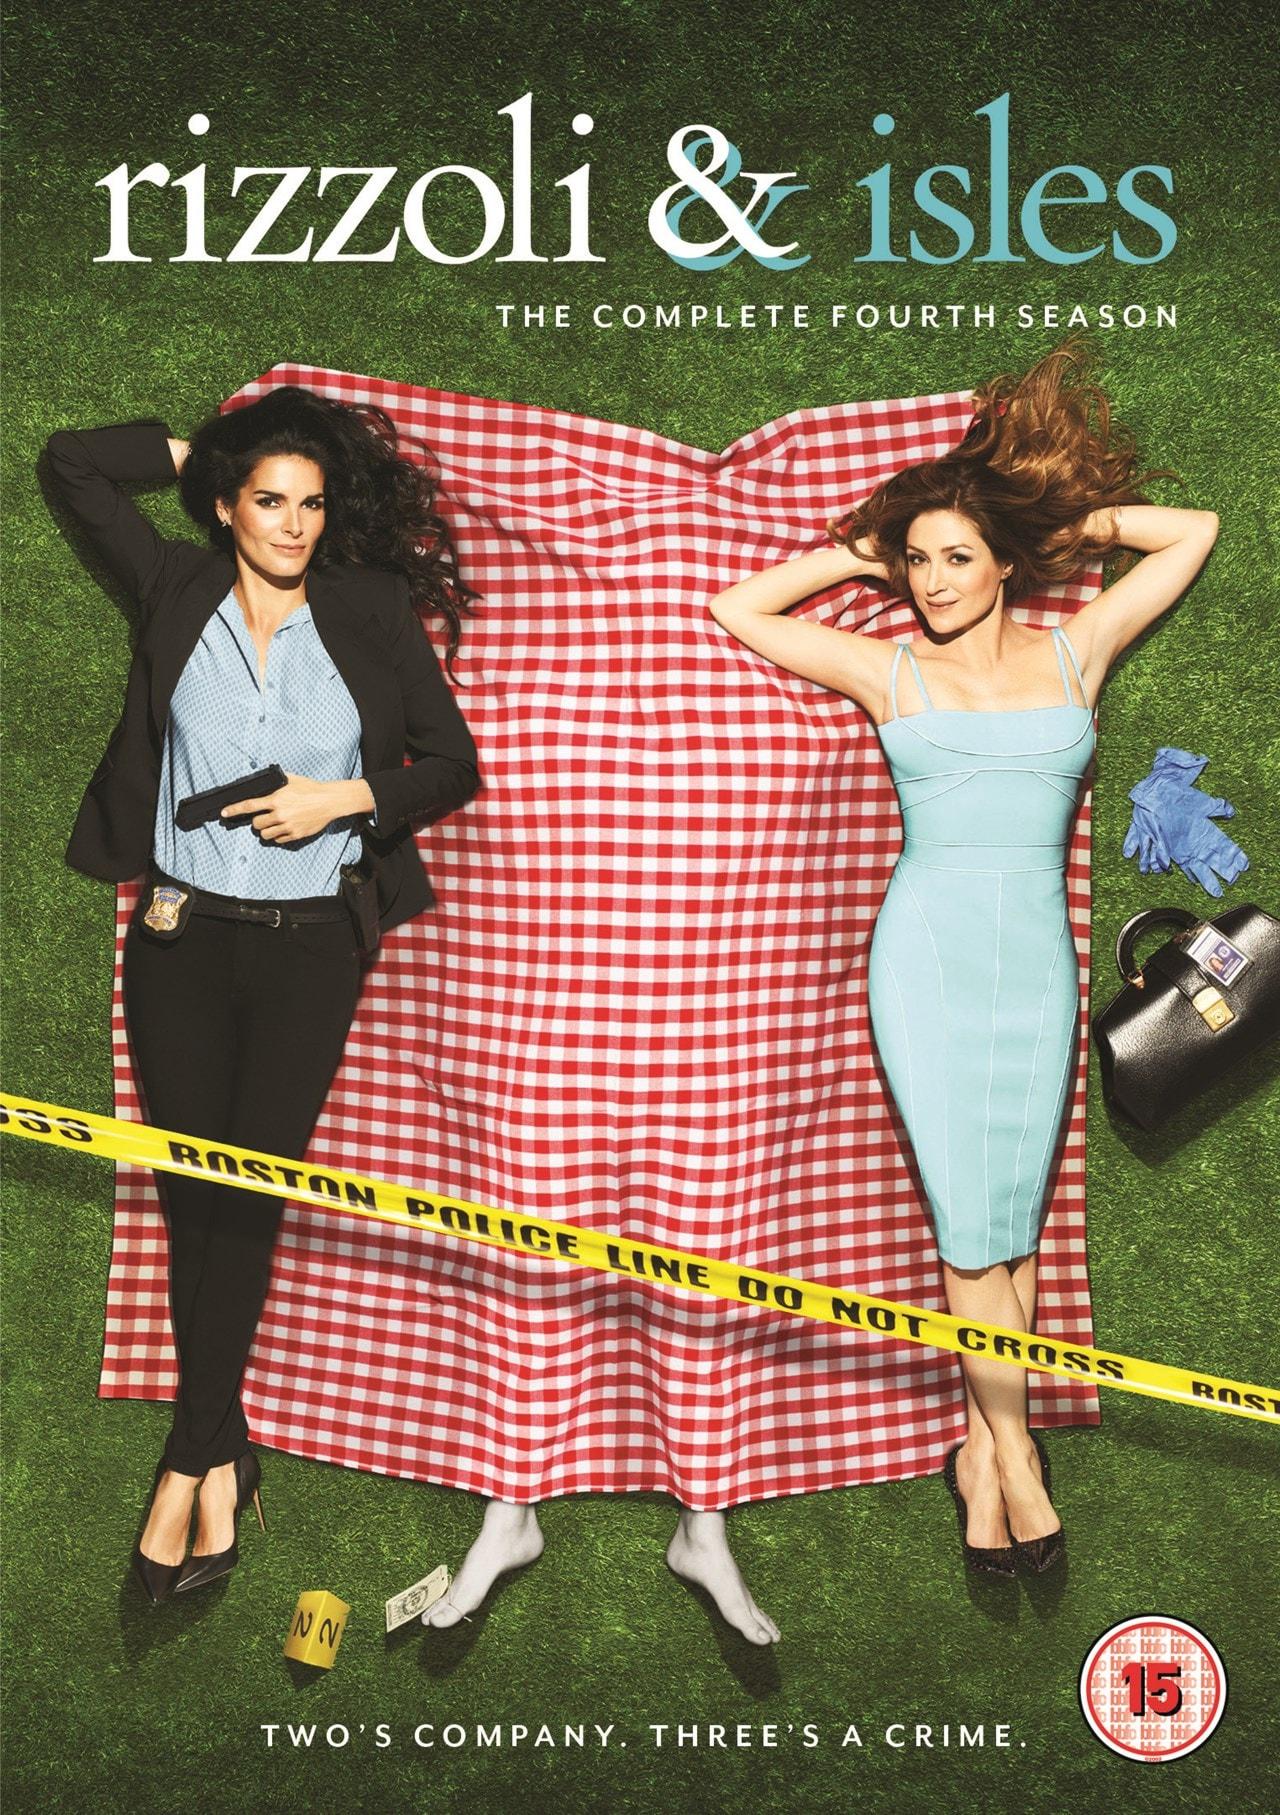 Rizzoli & Isles: The Complete Fourth Season - 1